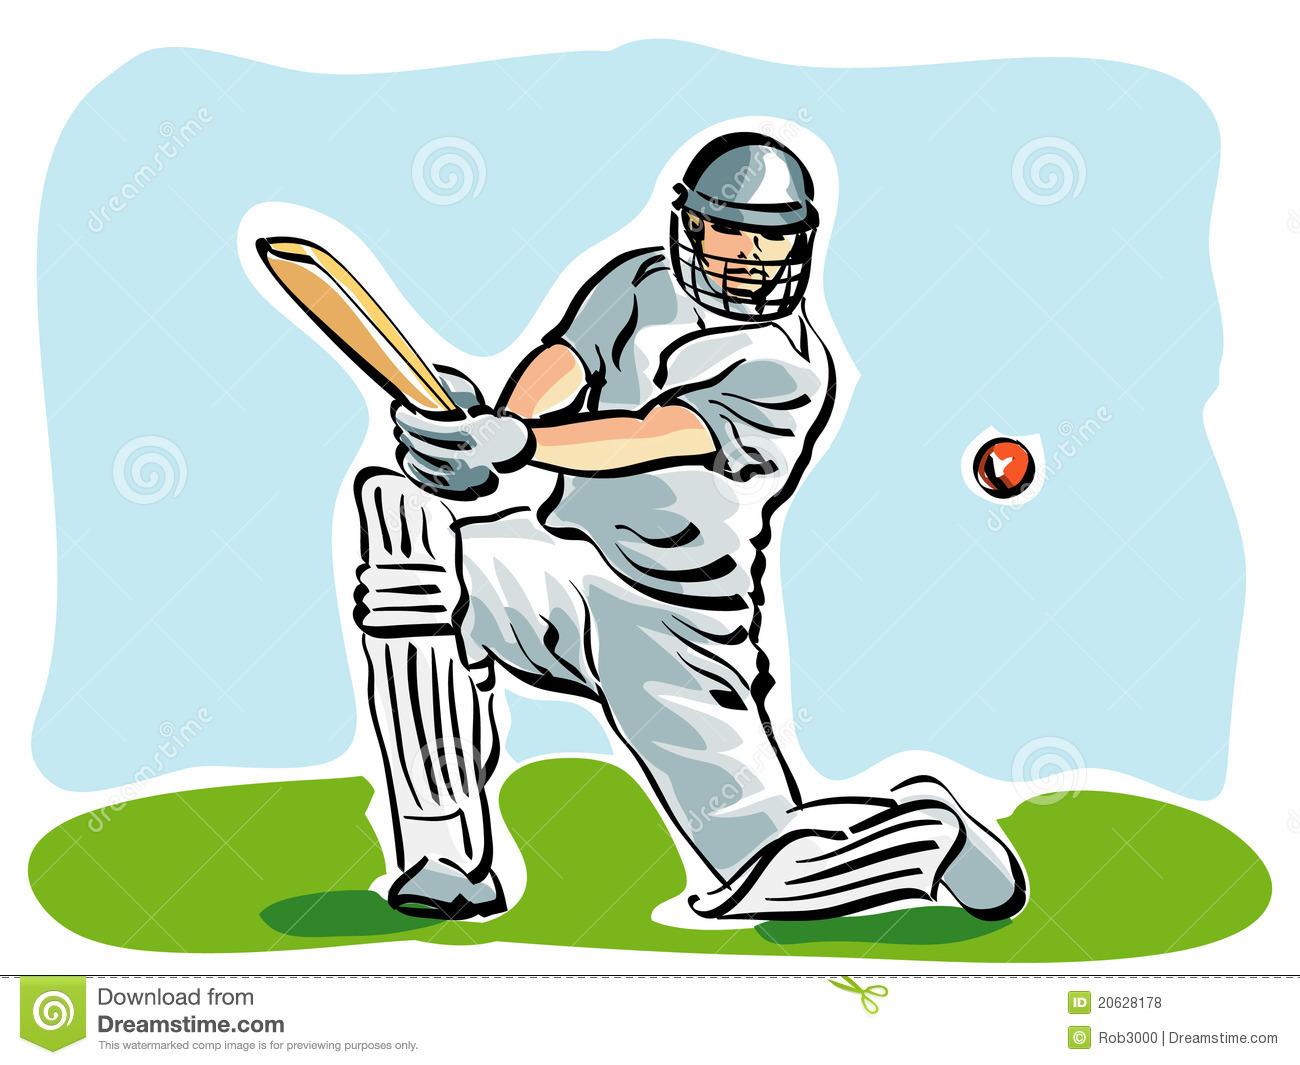 Cricket Royalty Free Stock Photos Image 20628178 #rBpMQe - Clipart Kid